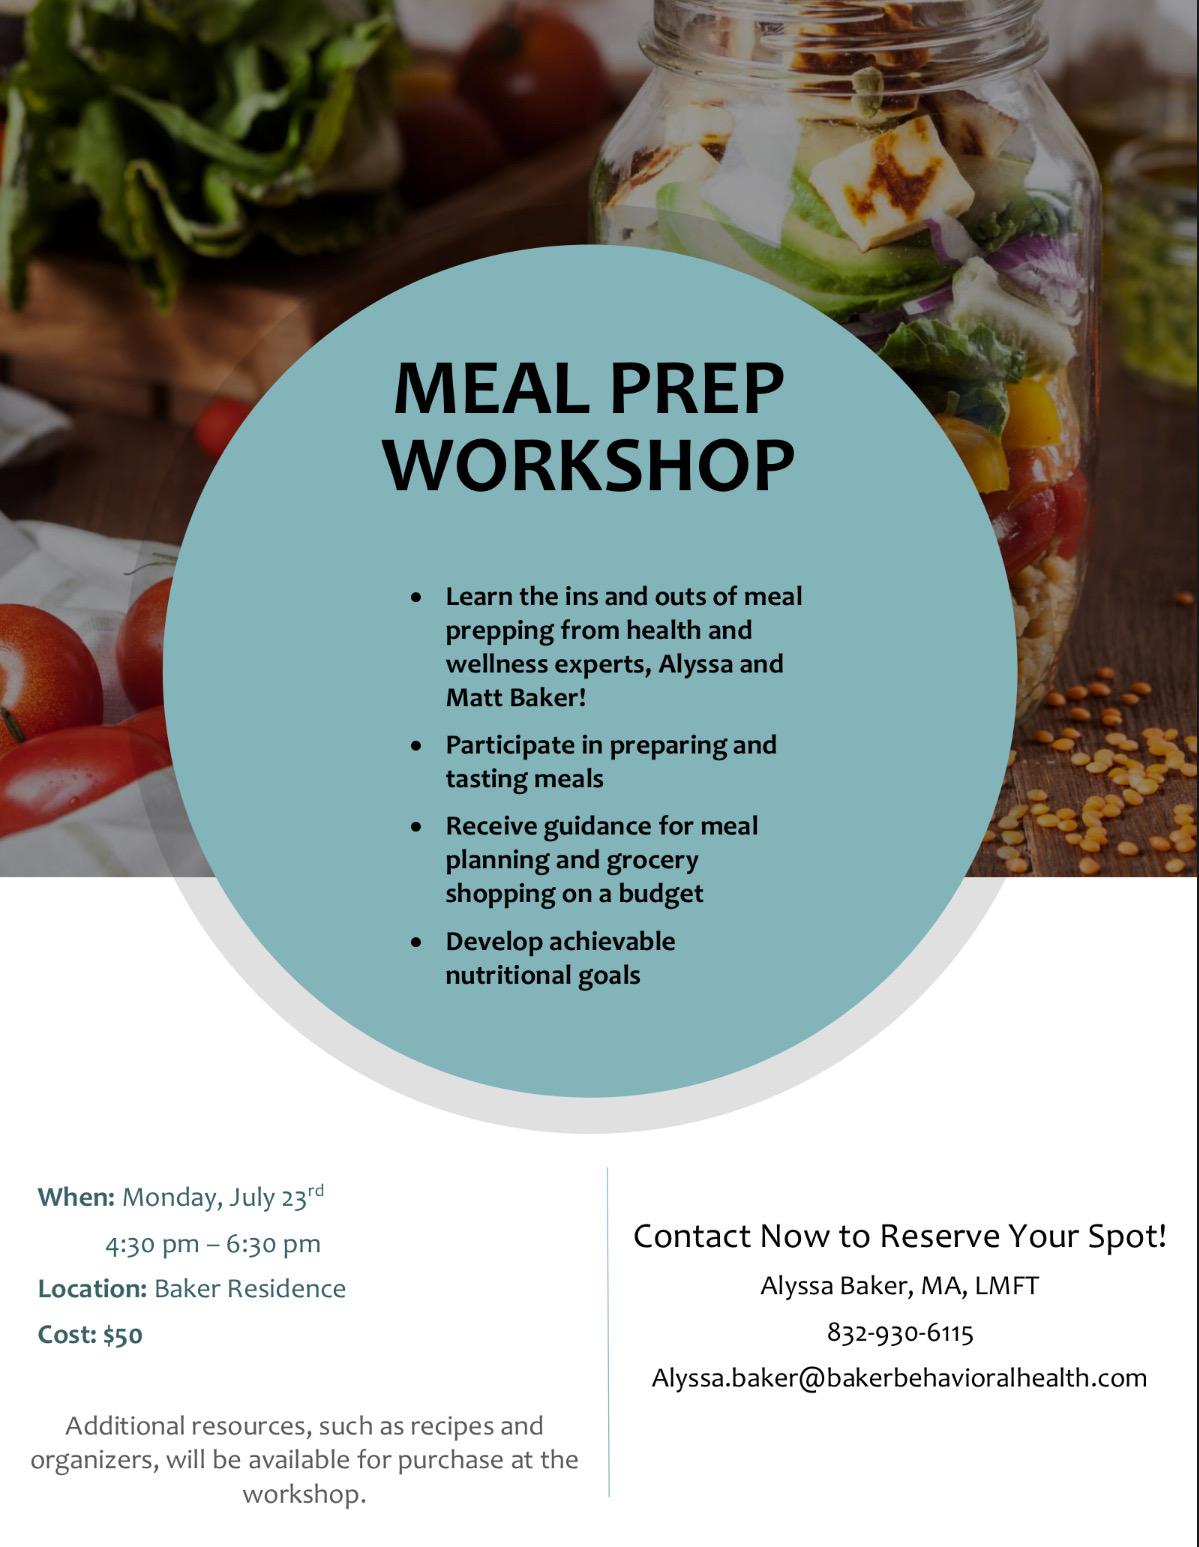 Meal prep image flyer.jpg